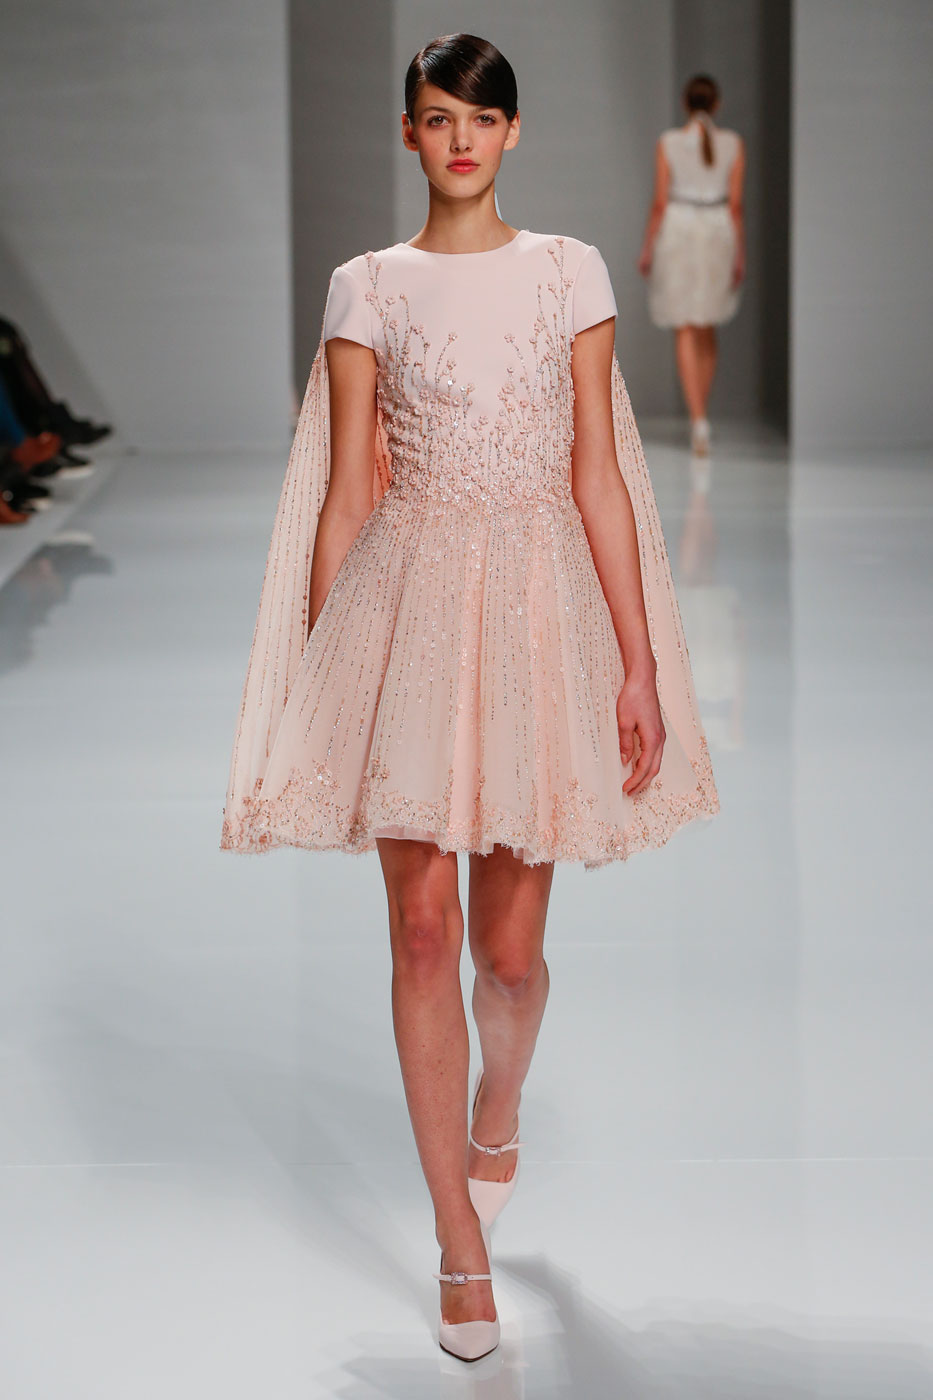 Georges-Hobeika-fashion-runway-show-haute-couture-paris-spring-2015-the-impression-69